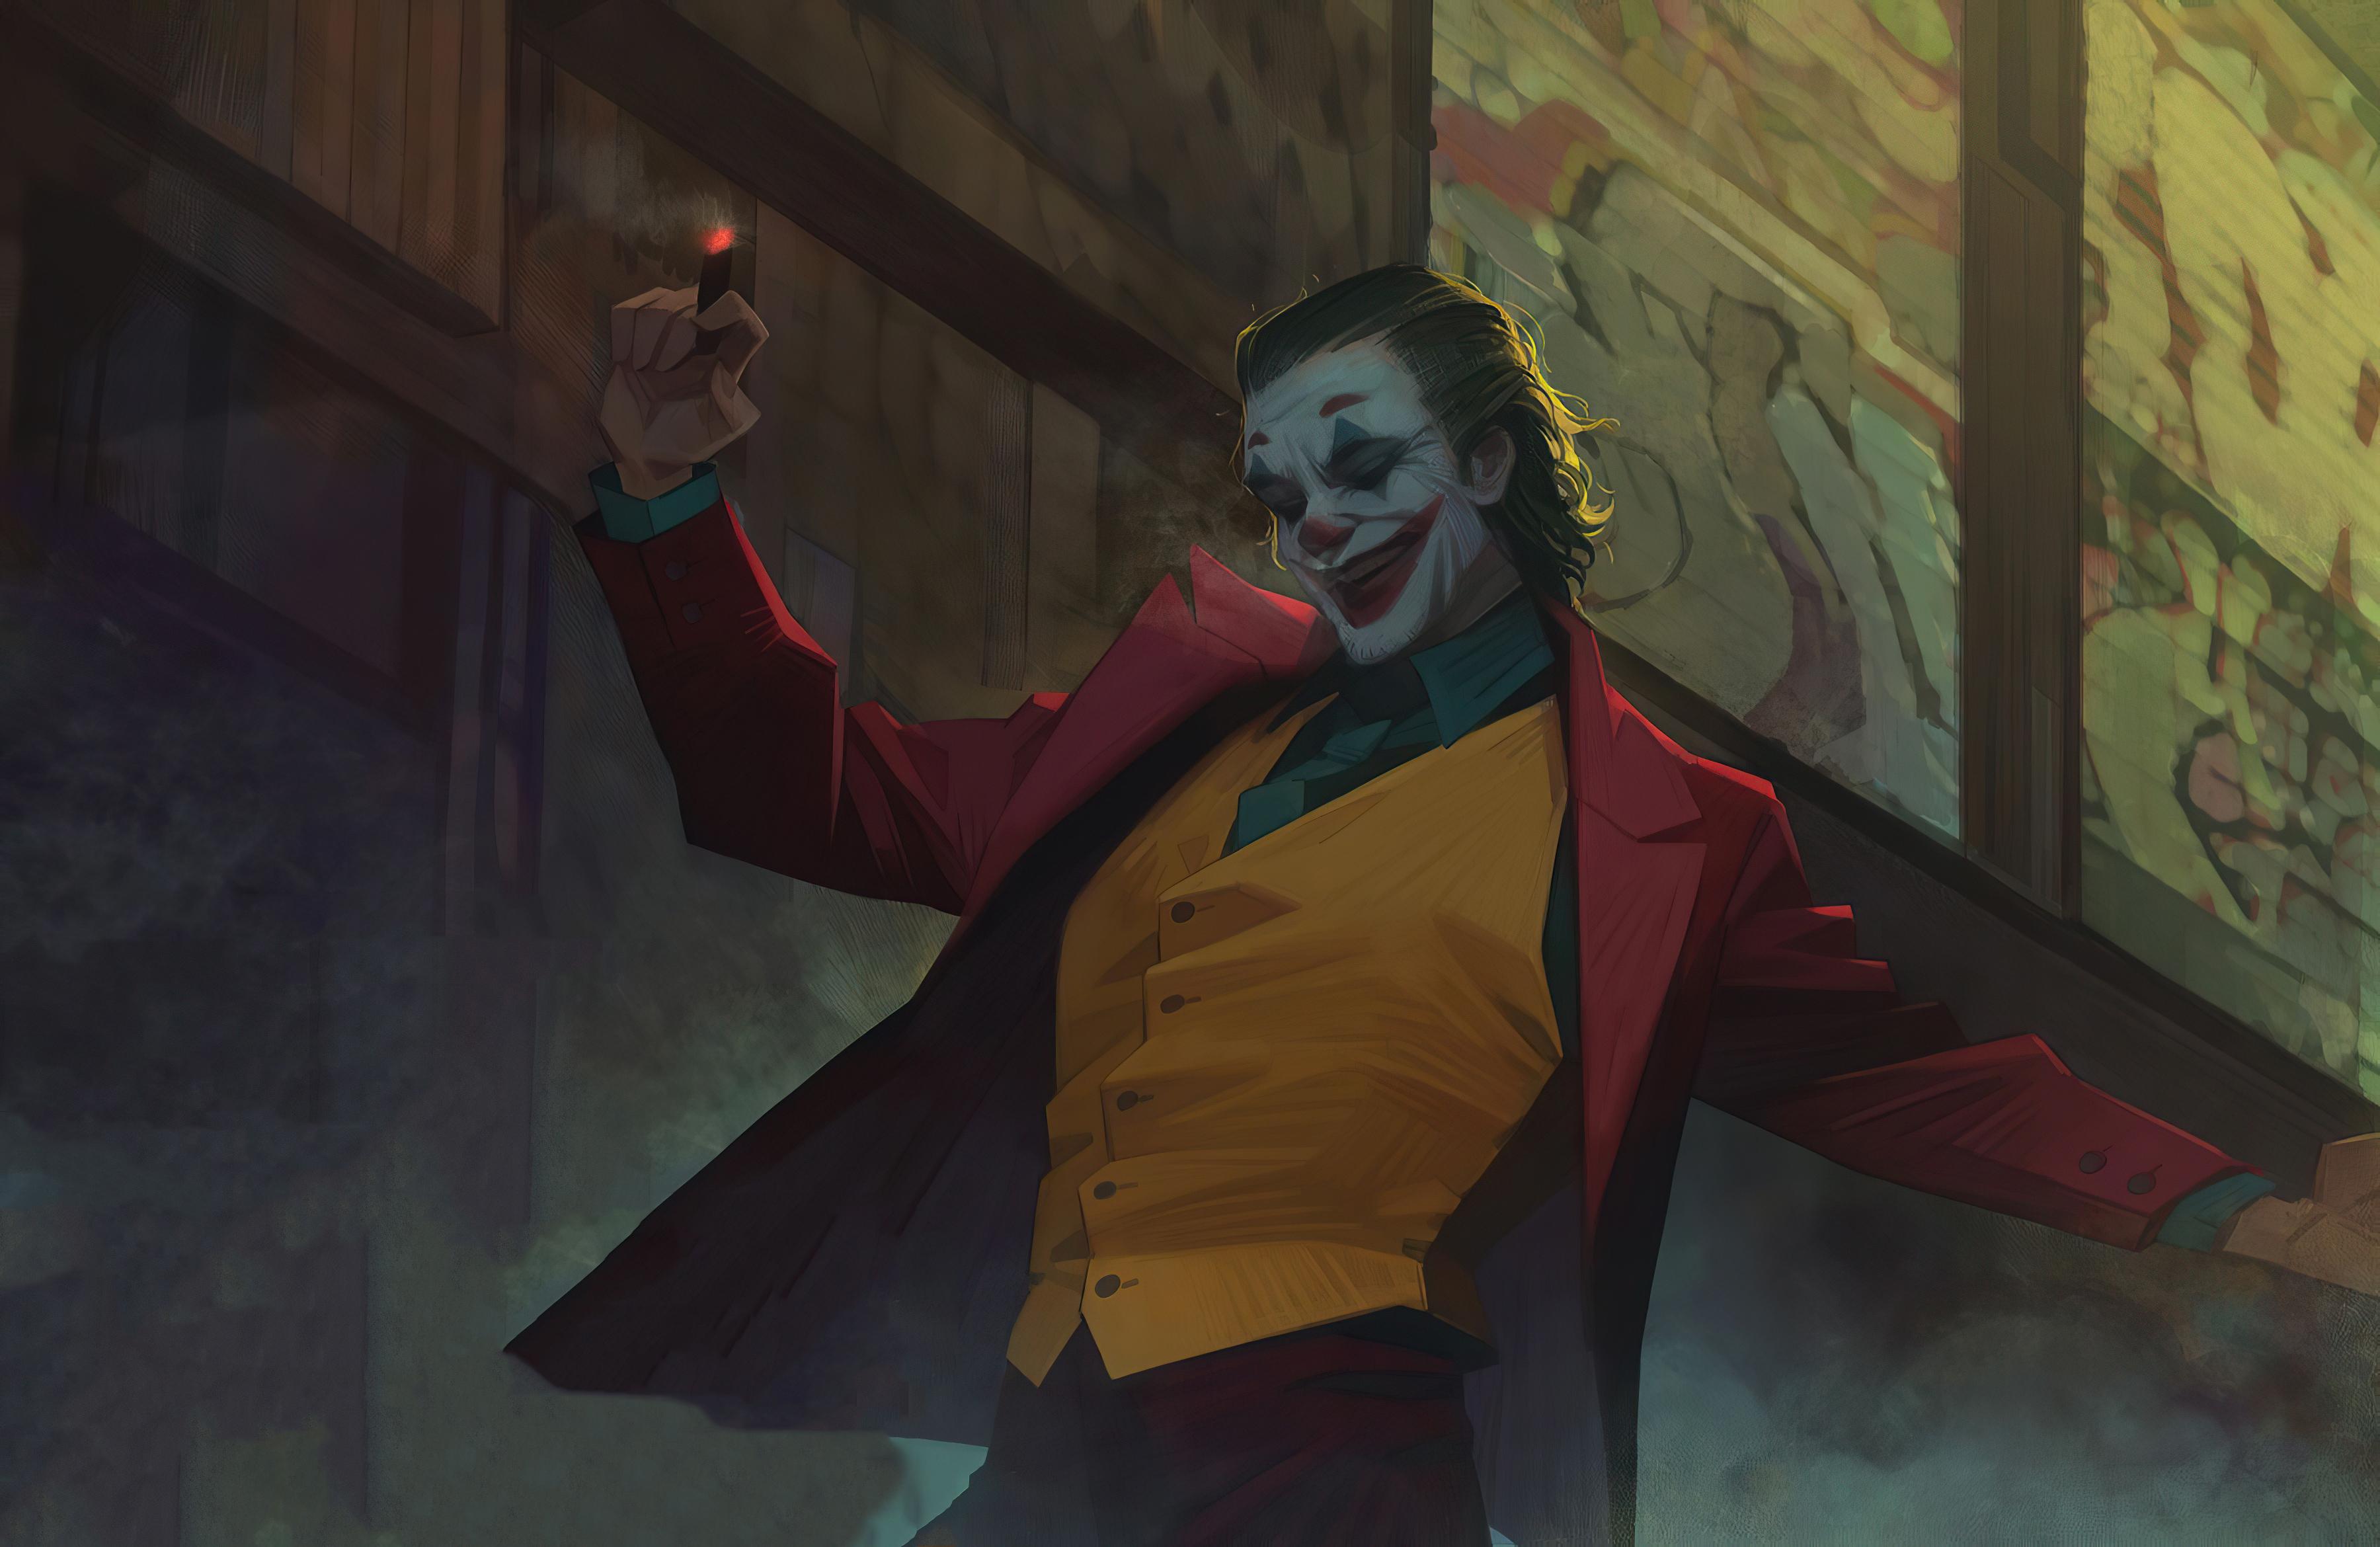 Wallpaper Joker dancing in stairs